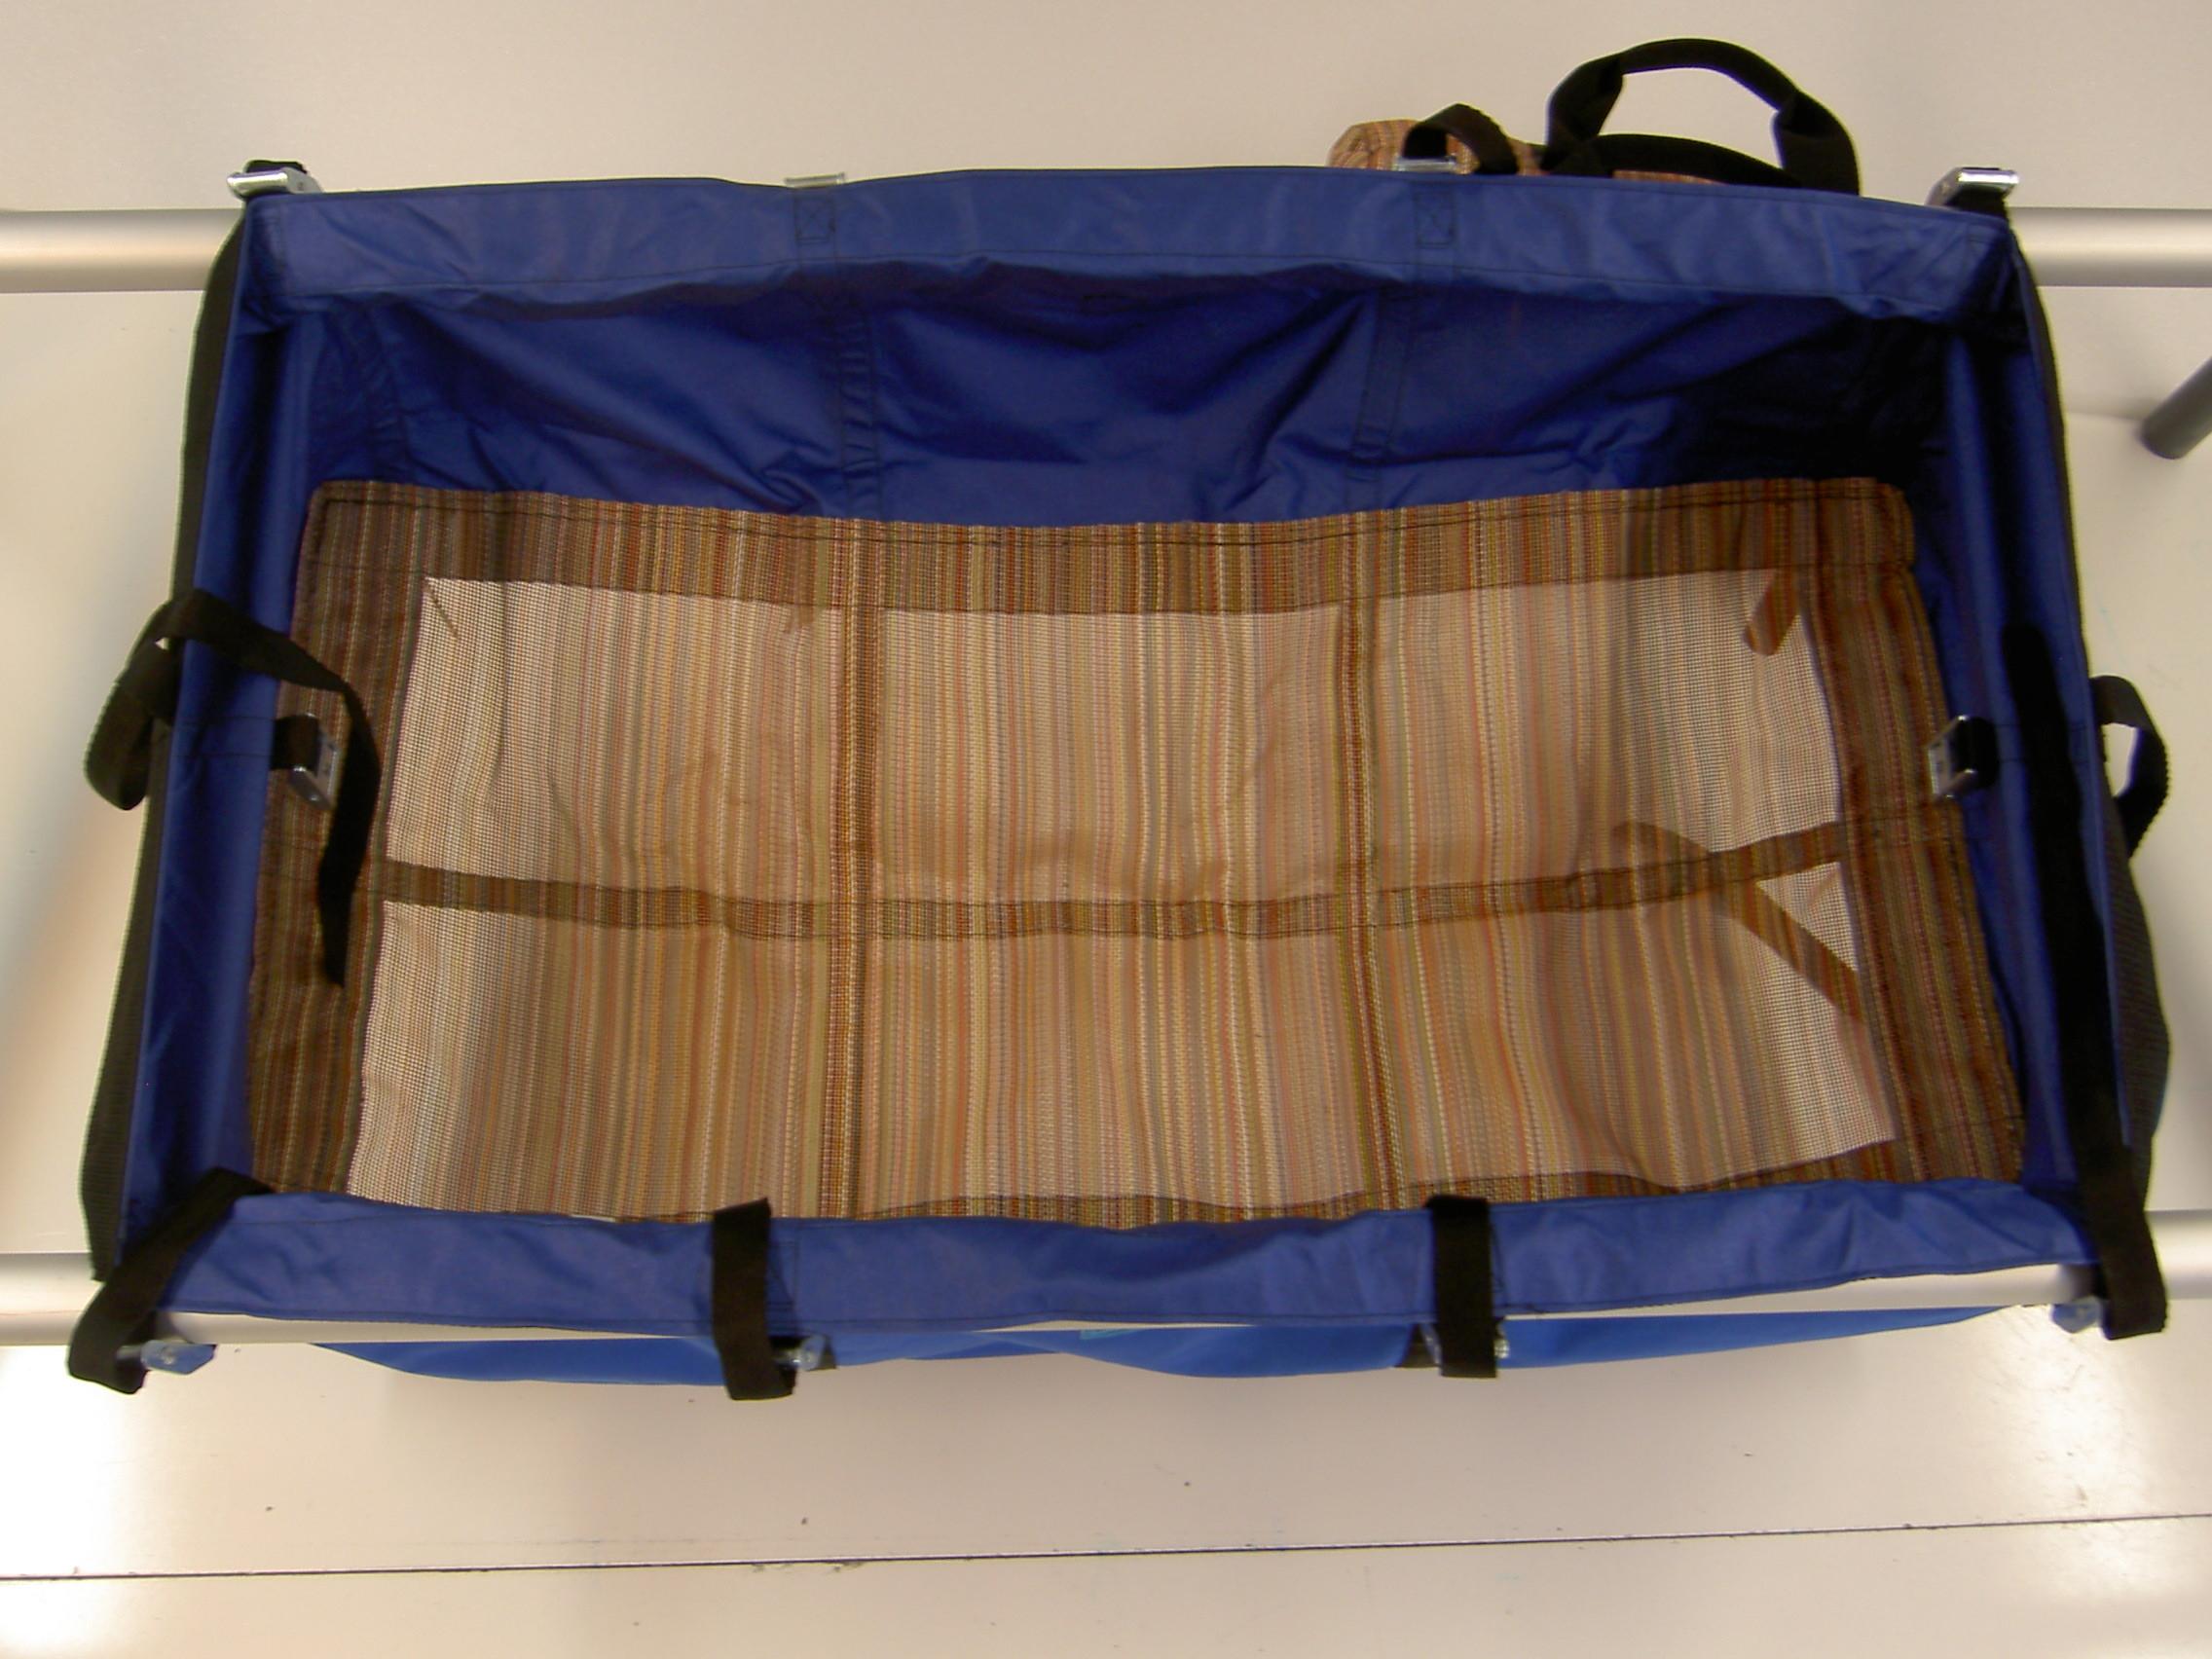 Summit River Gear Drop Bag